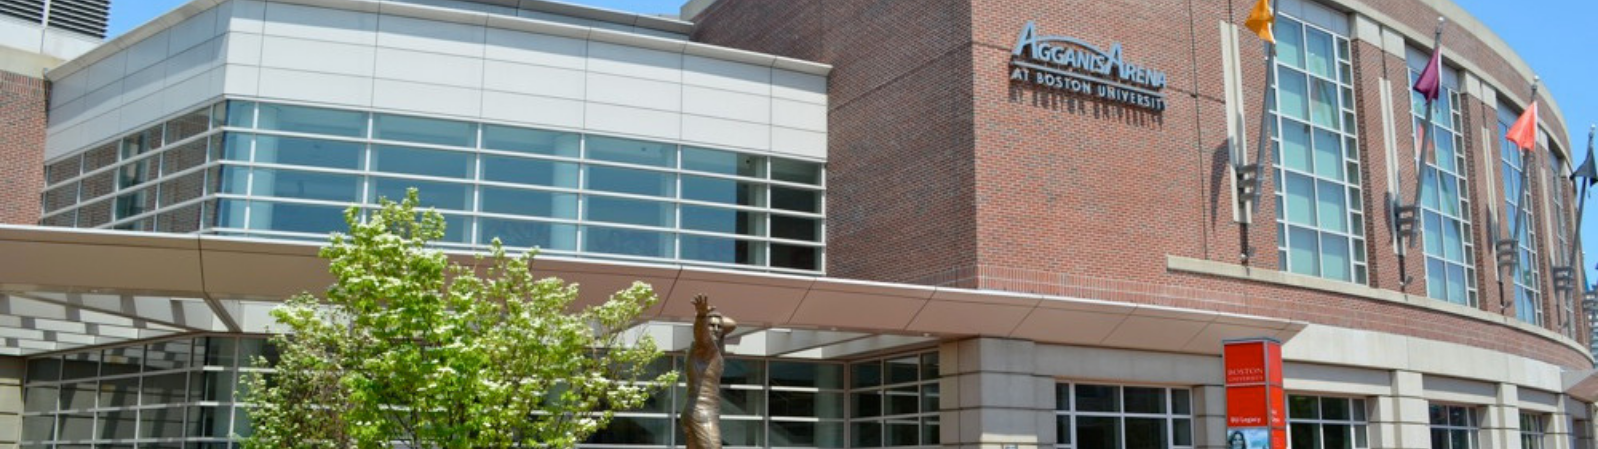 Agganis Arena, Boston University